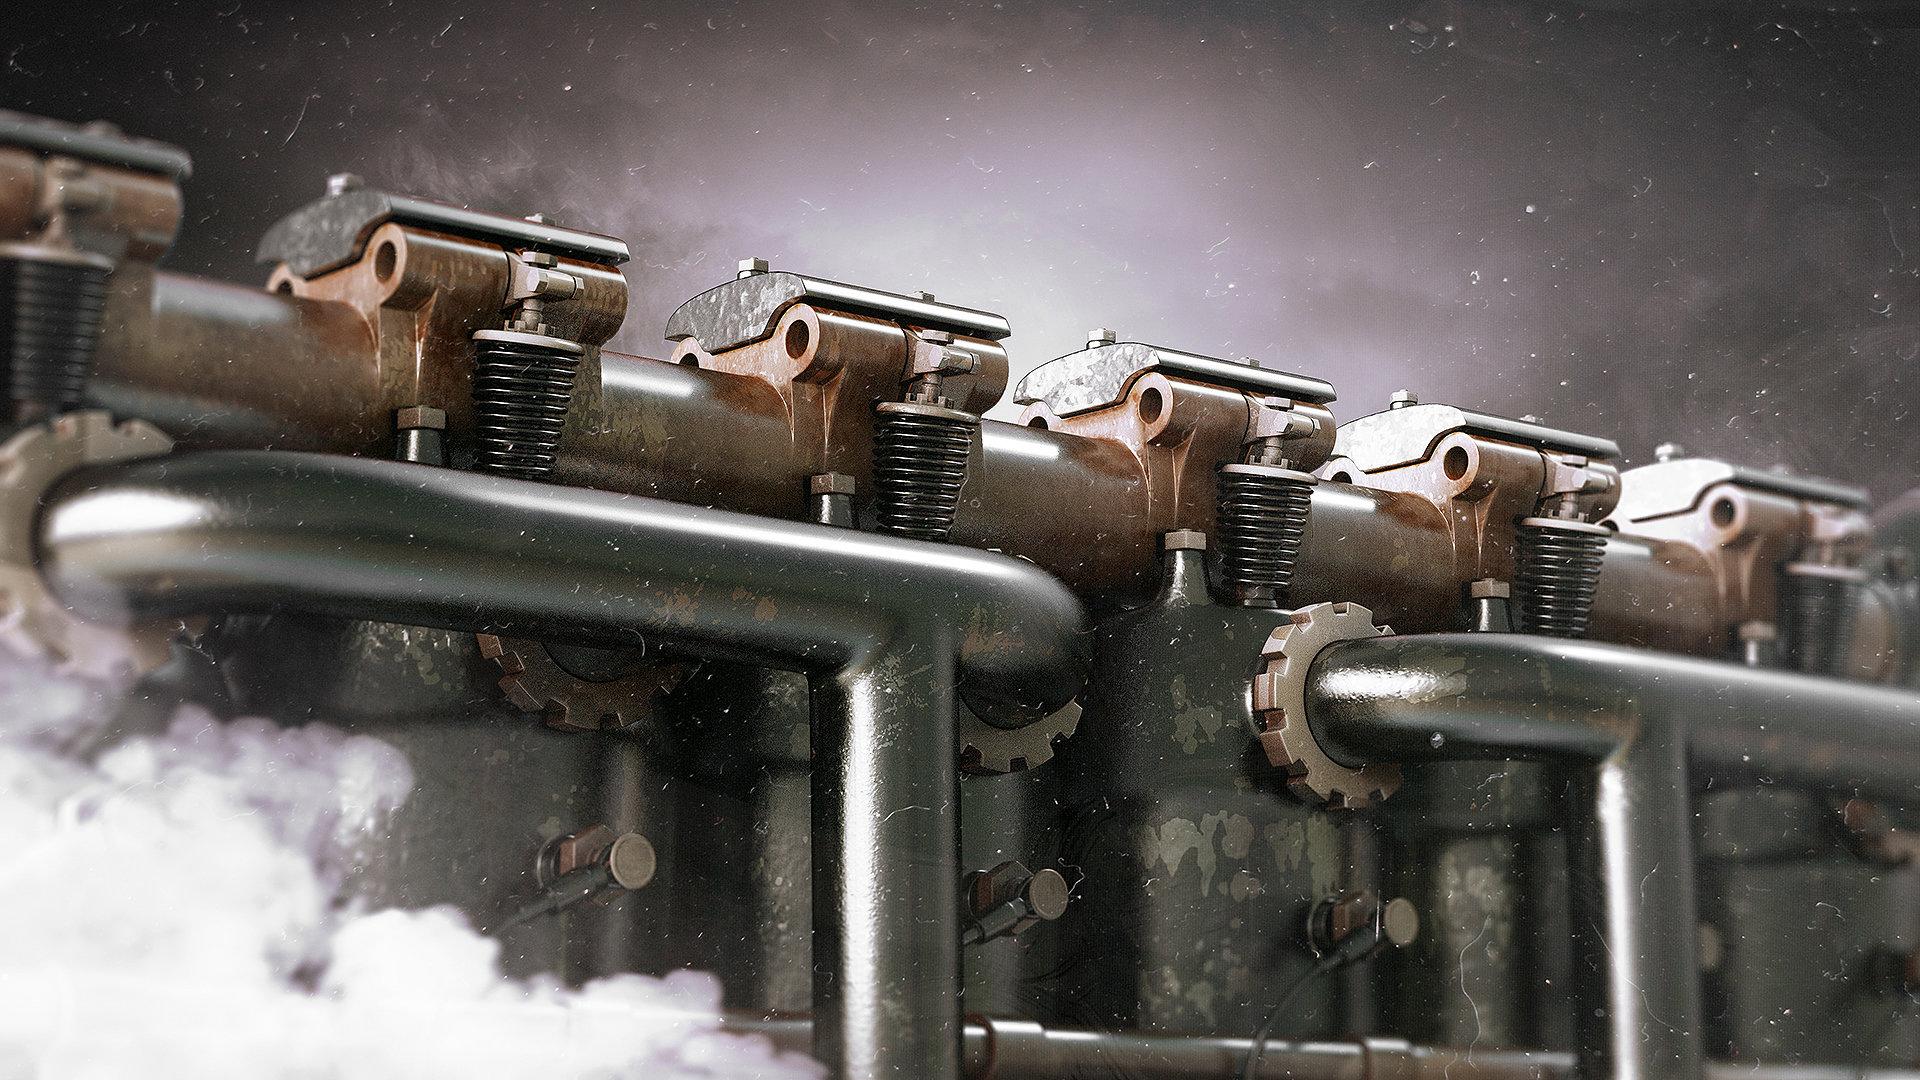 Alexandr novitskiy mercedes diii engine 05